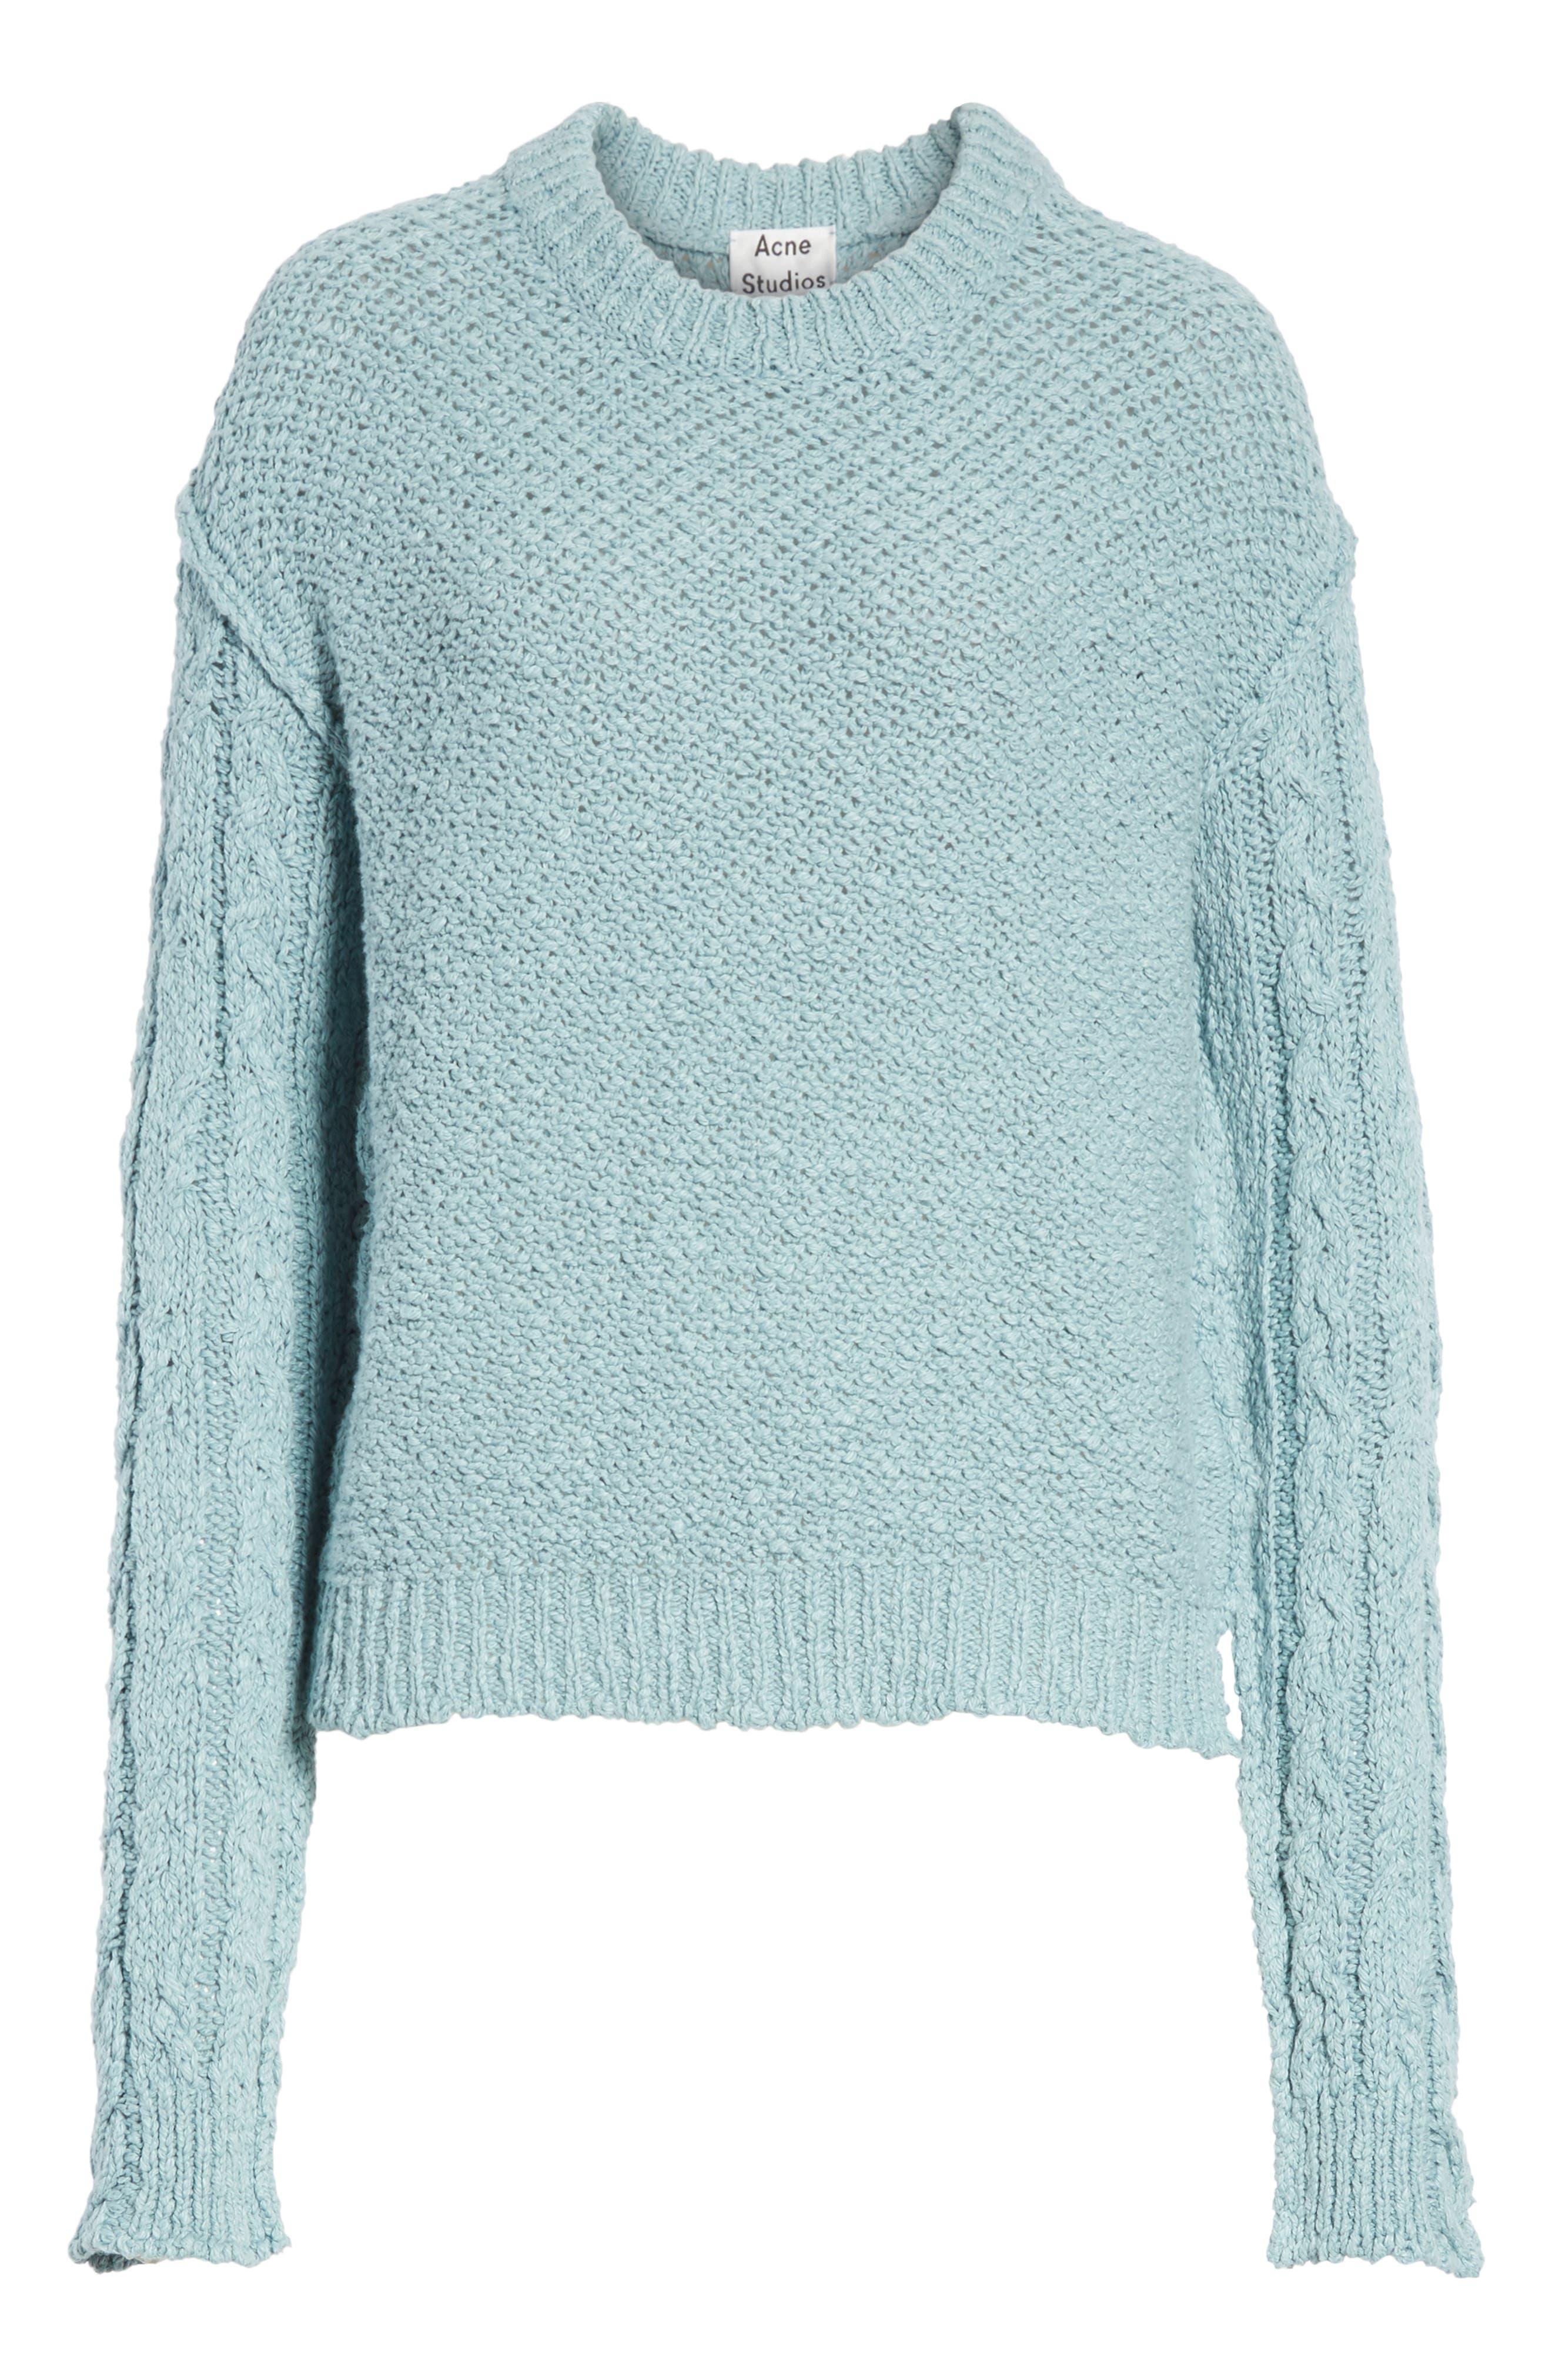 Acne Studios Hila Cable Sleeve Sweater